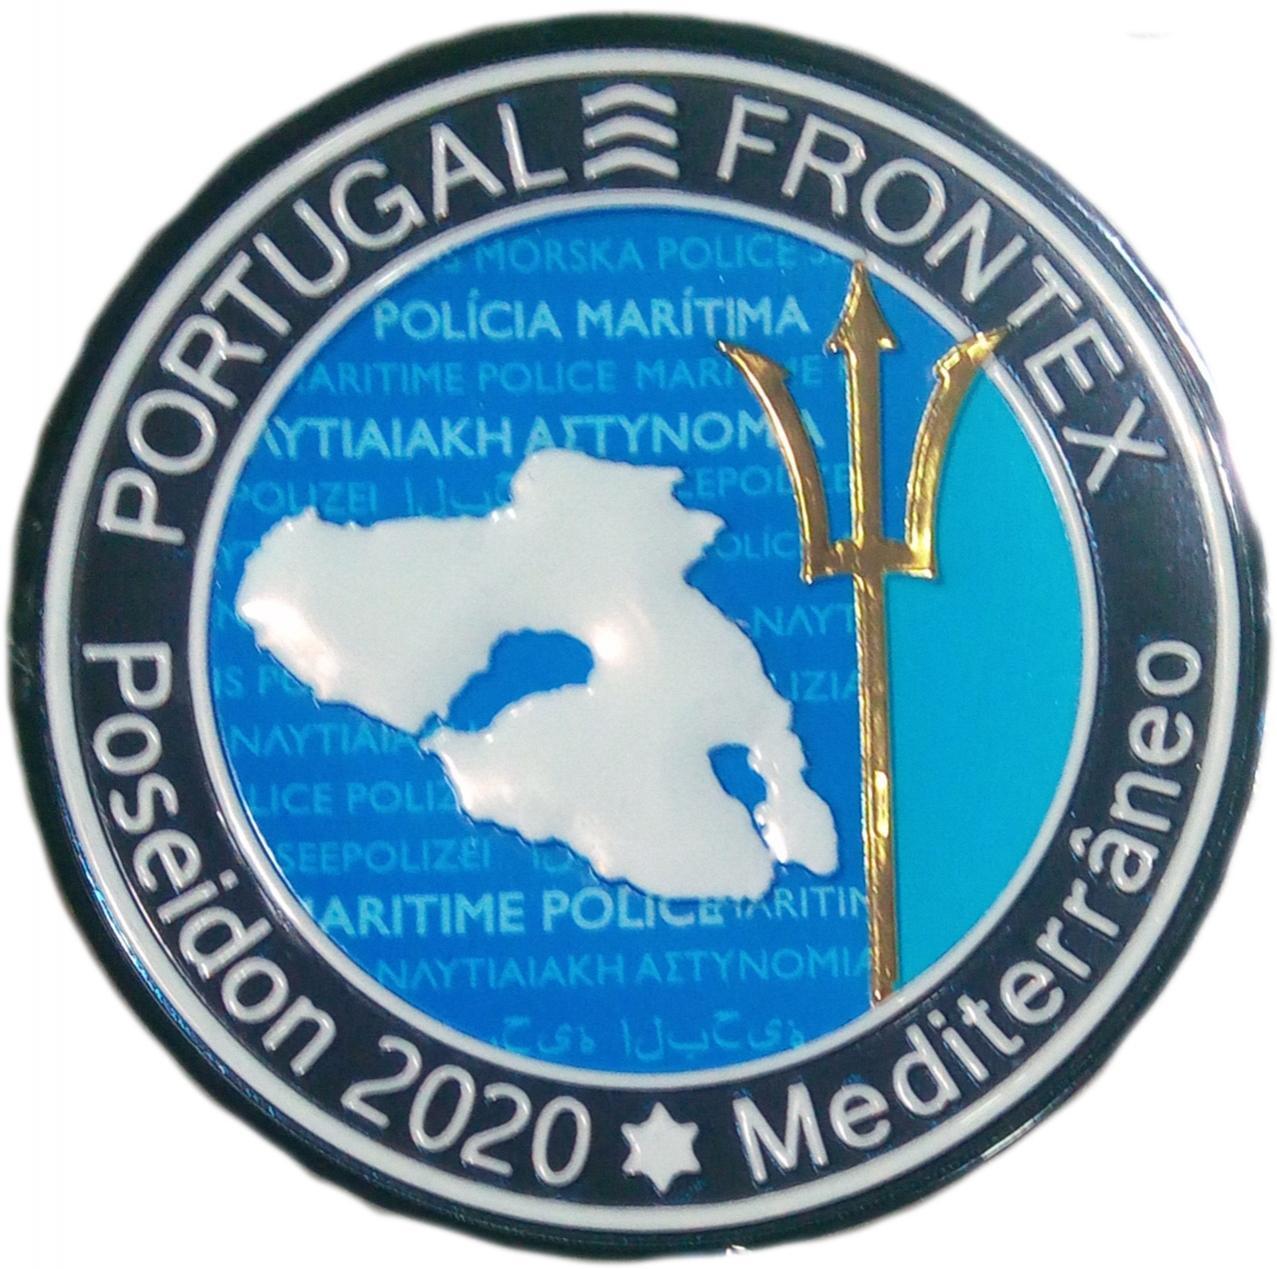 POLICÍA DE EUROPA EUROPOL FRONTEX MISIÓN POSEIDÓN 2020 MEDITERRANEO PORTUGAL PARCHE INSIGNIA EMBLEMA DISTINTIVO